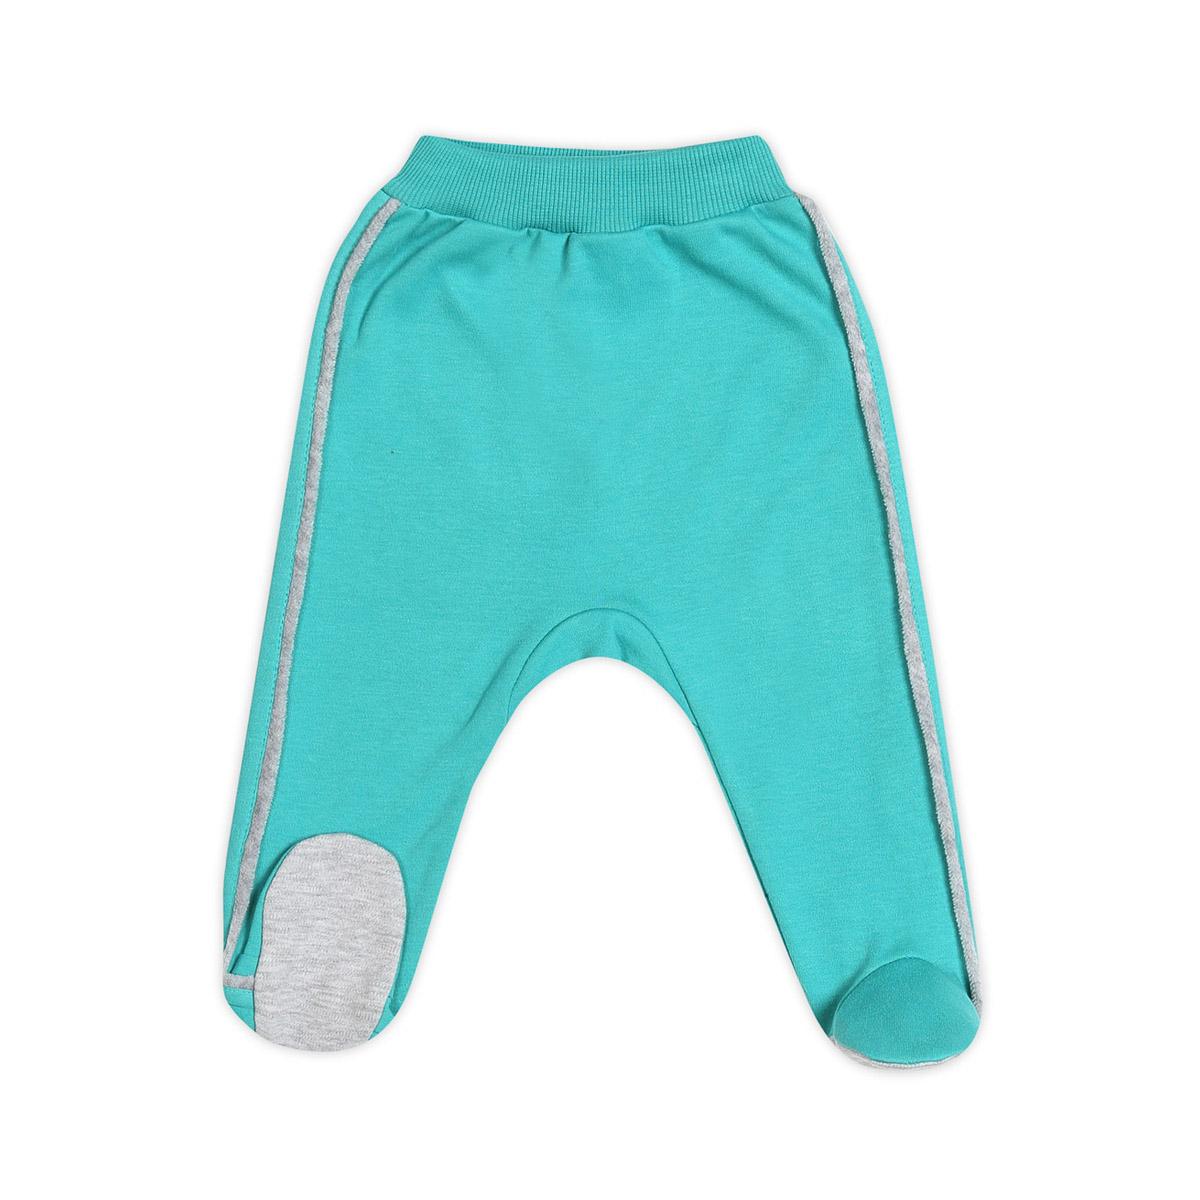 Ползунки с ножками Ёмаё Спорт (26-265) рост 68 ярко-бирюзовый<br>